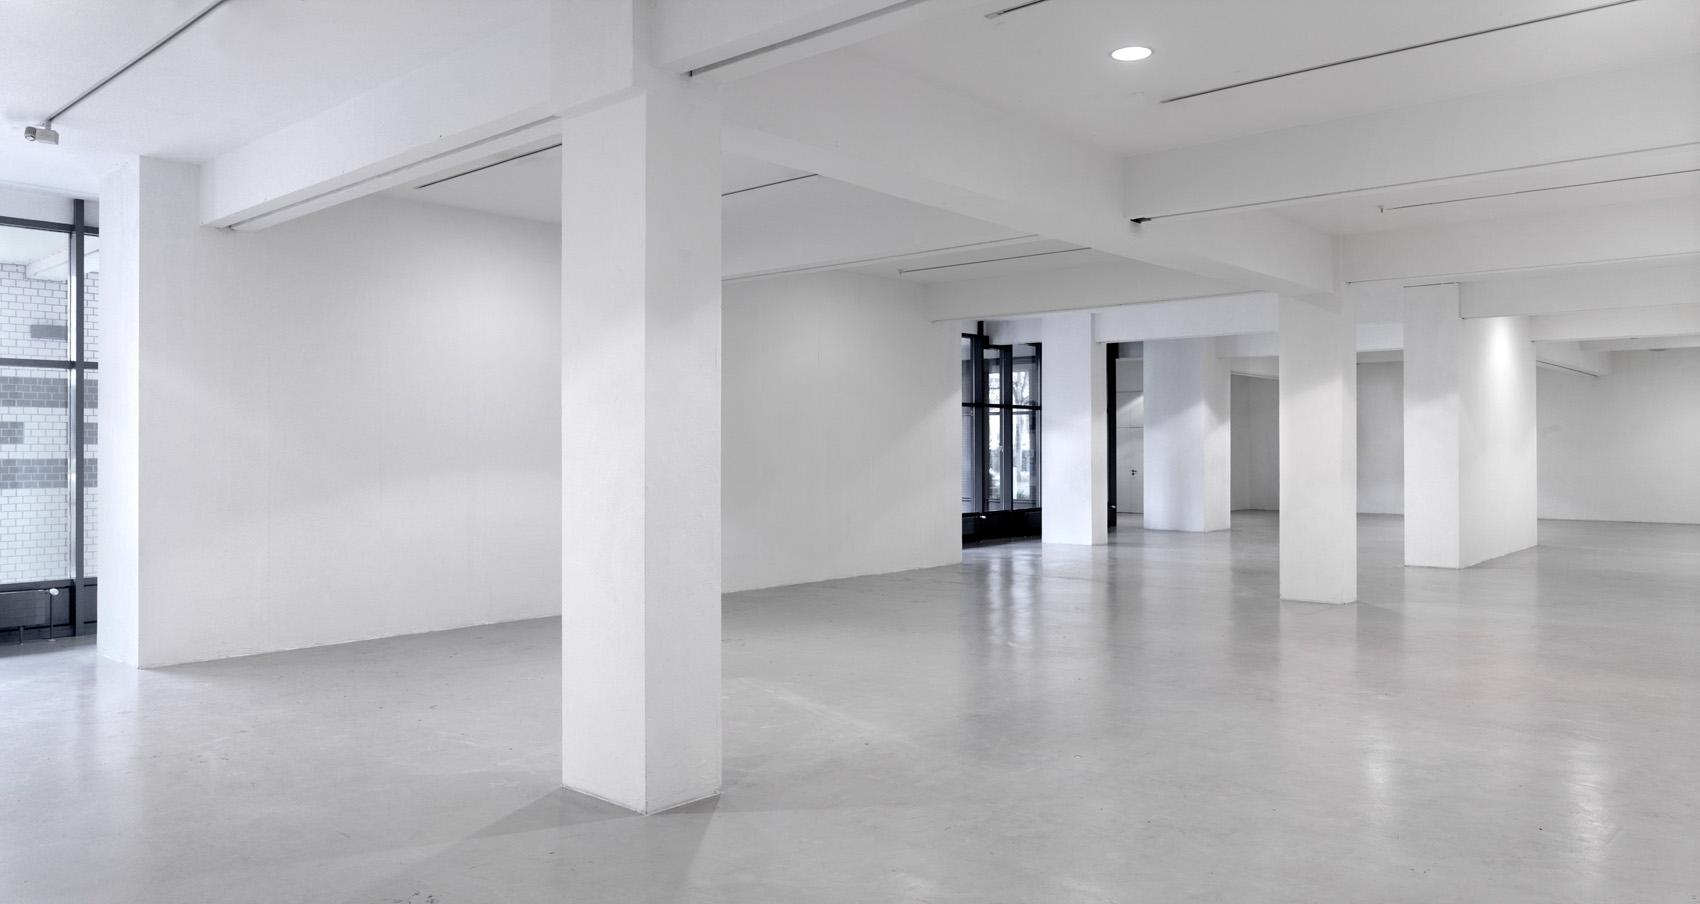 NKR Neuer Kunstraum Düsseldorf ArtJunk